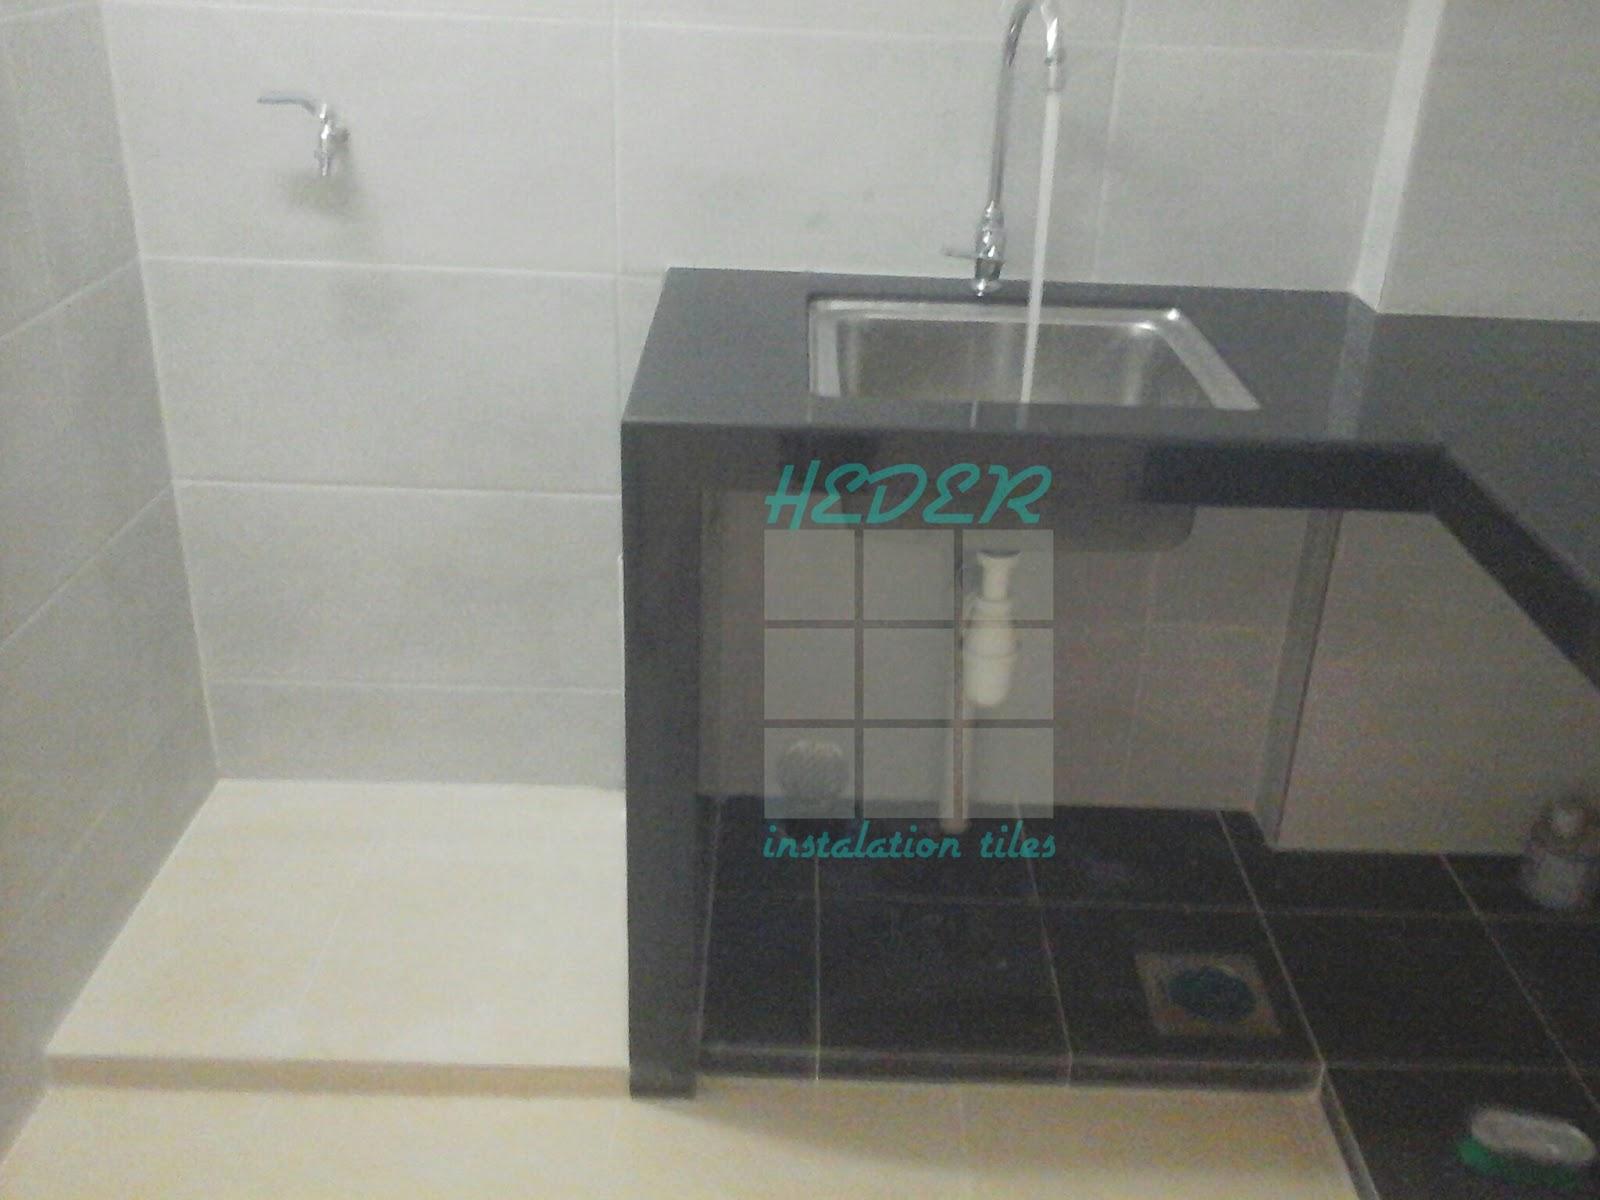 Ni Plan No 1 2 Sebelum Dan Selepas Ubah Suai Ruang Asal Ukuran 6x13 Ade Toilet Bilik Mandi Dapur Sangat Lah Sempit Kalau Owner Yang Masak